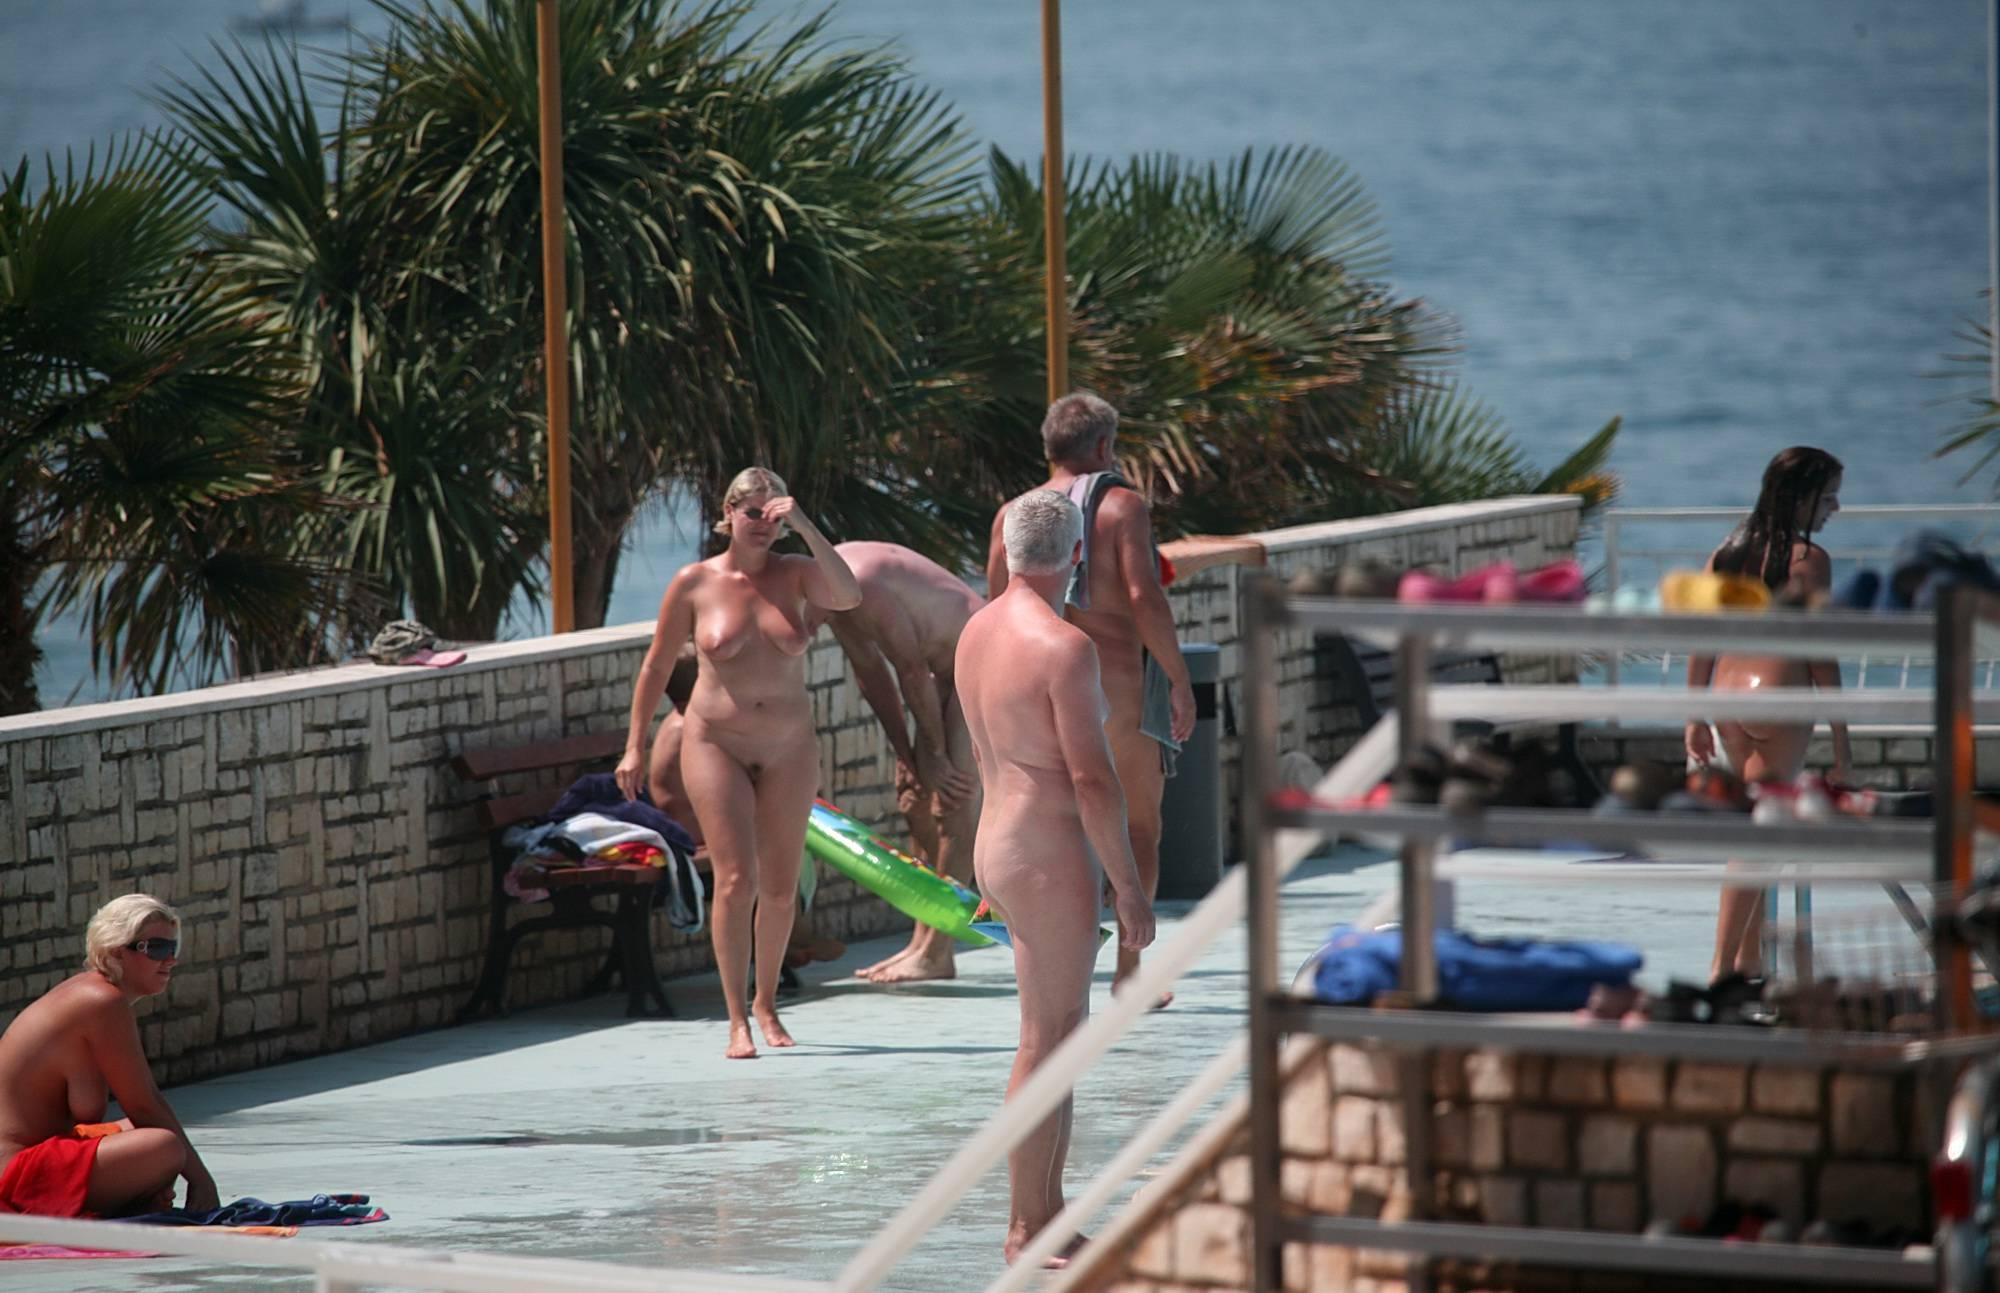 Pure Nudism Photos Assorted Naturist Profiles - 1